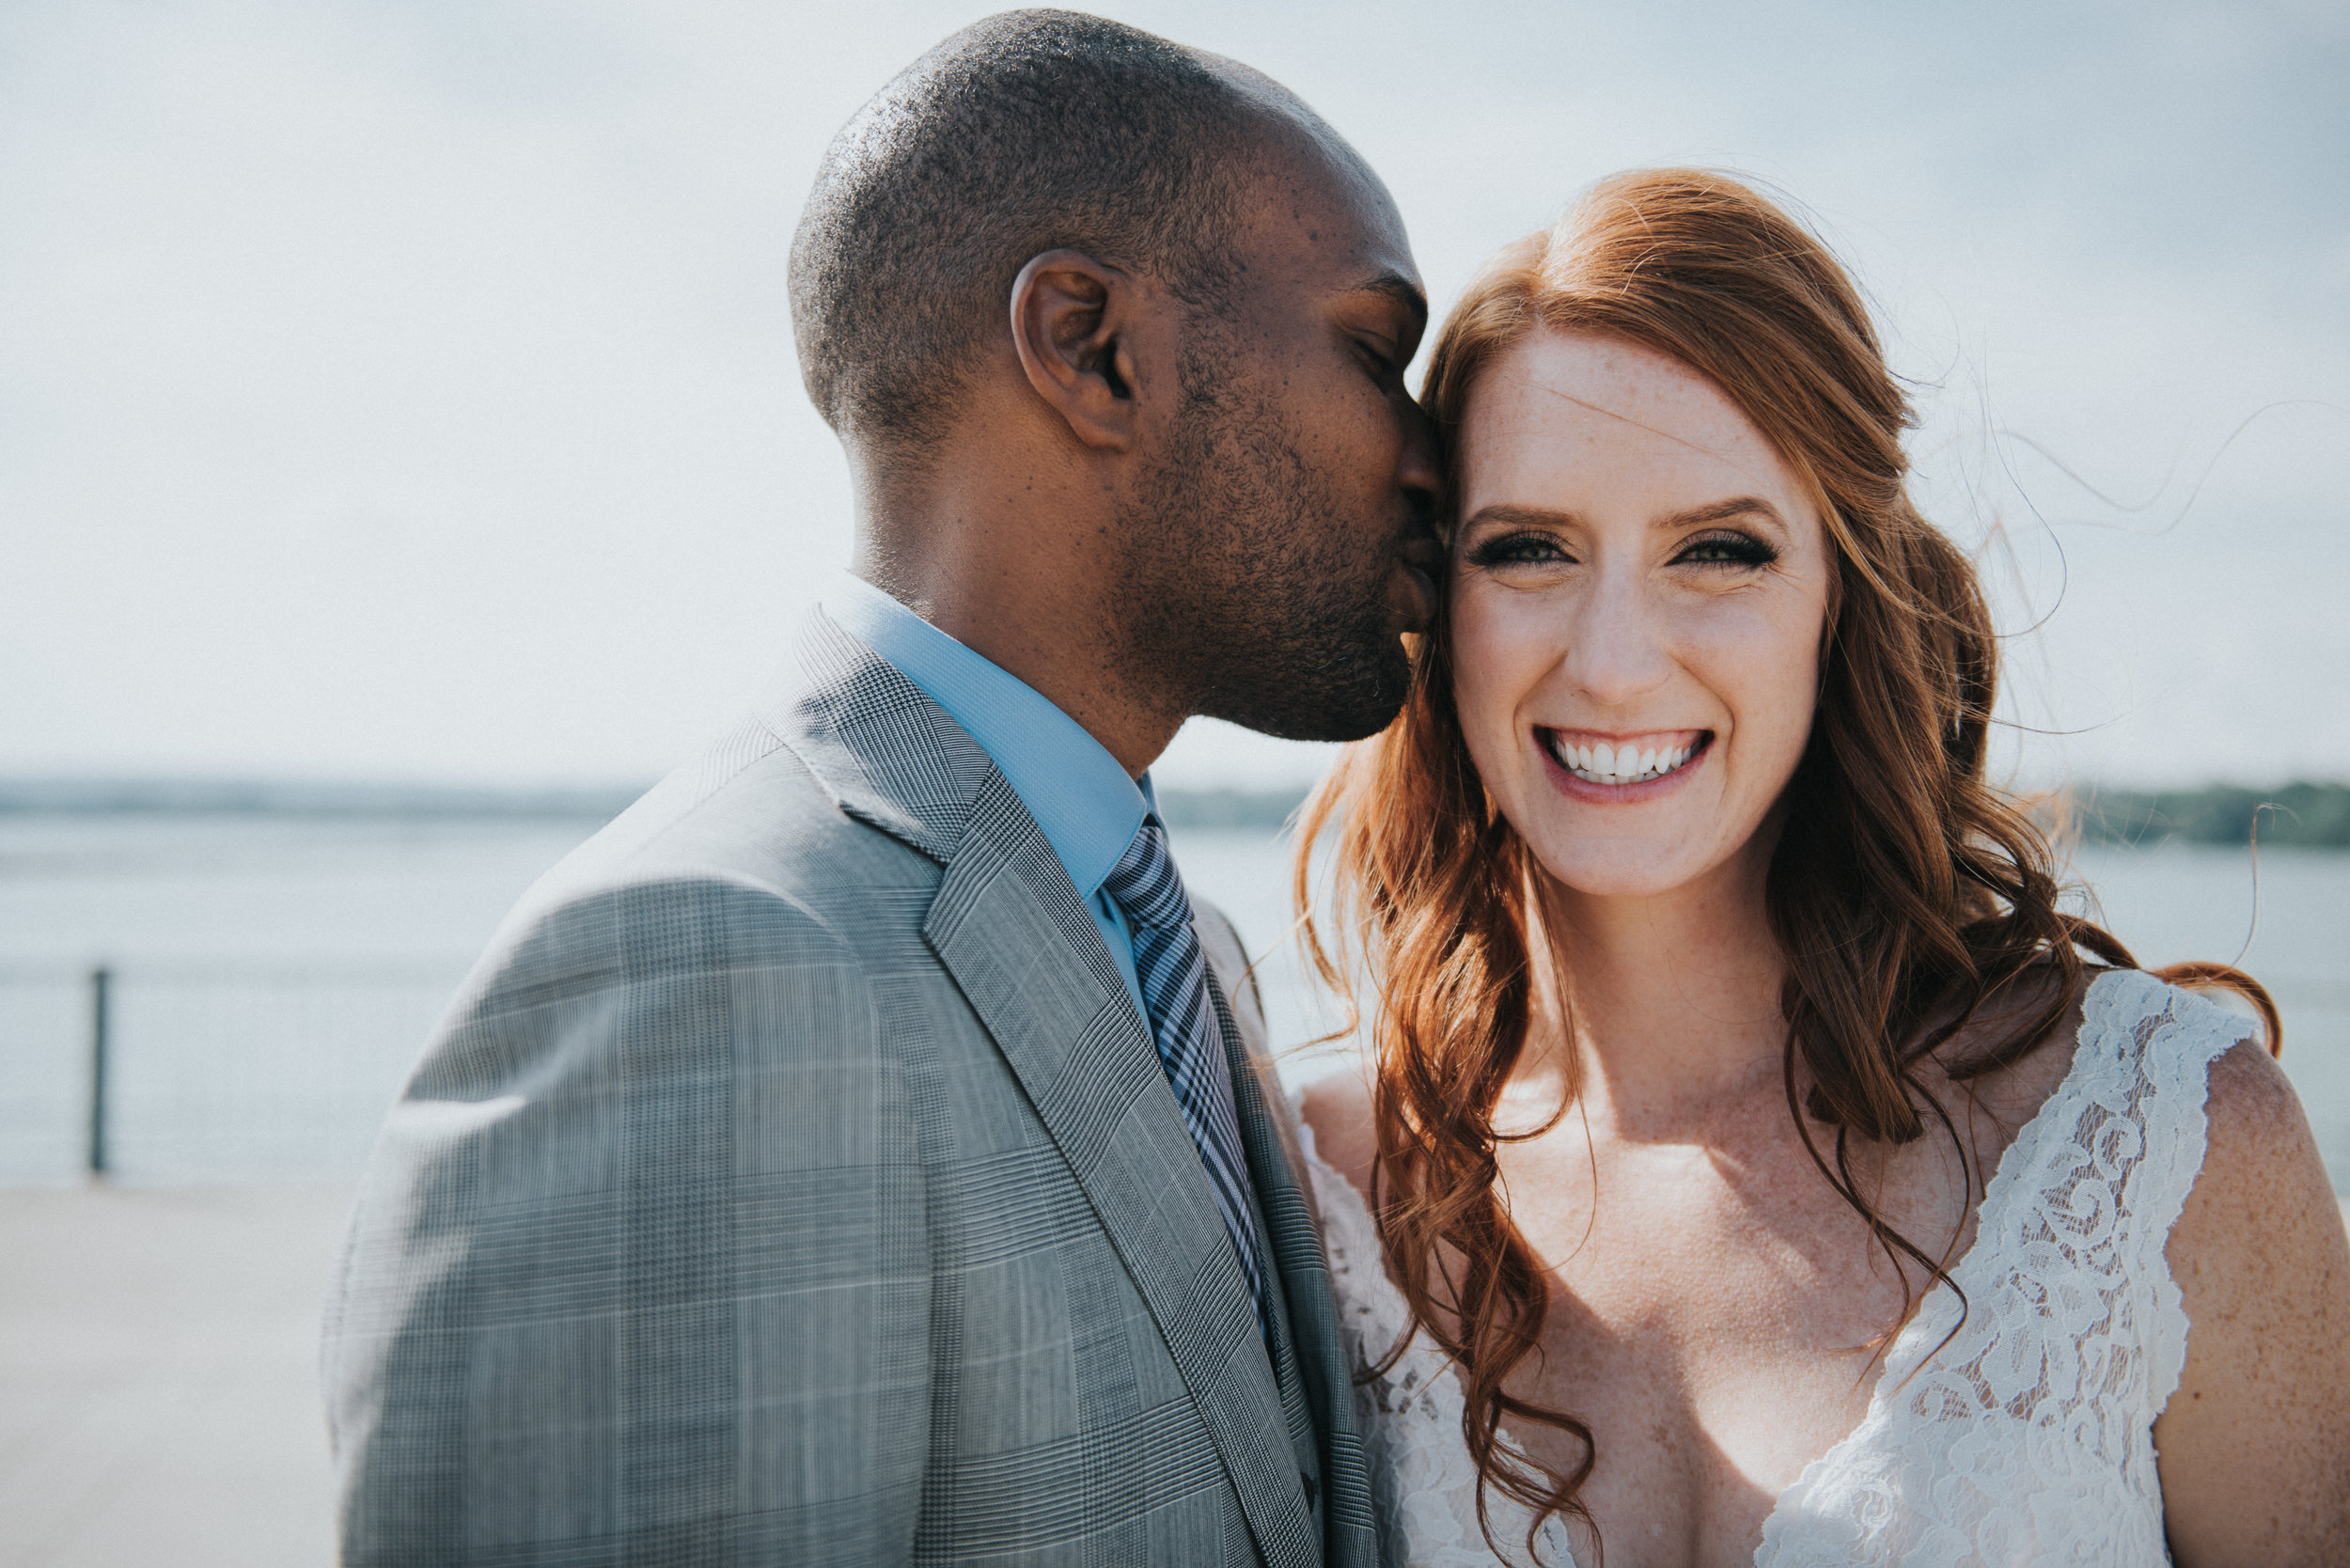 bride-groom-portraits-toronto-outdoor-summer-wedding-documentary-wedding-photography-by-willow-birch-photo.jpg